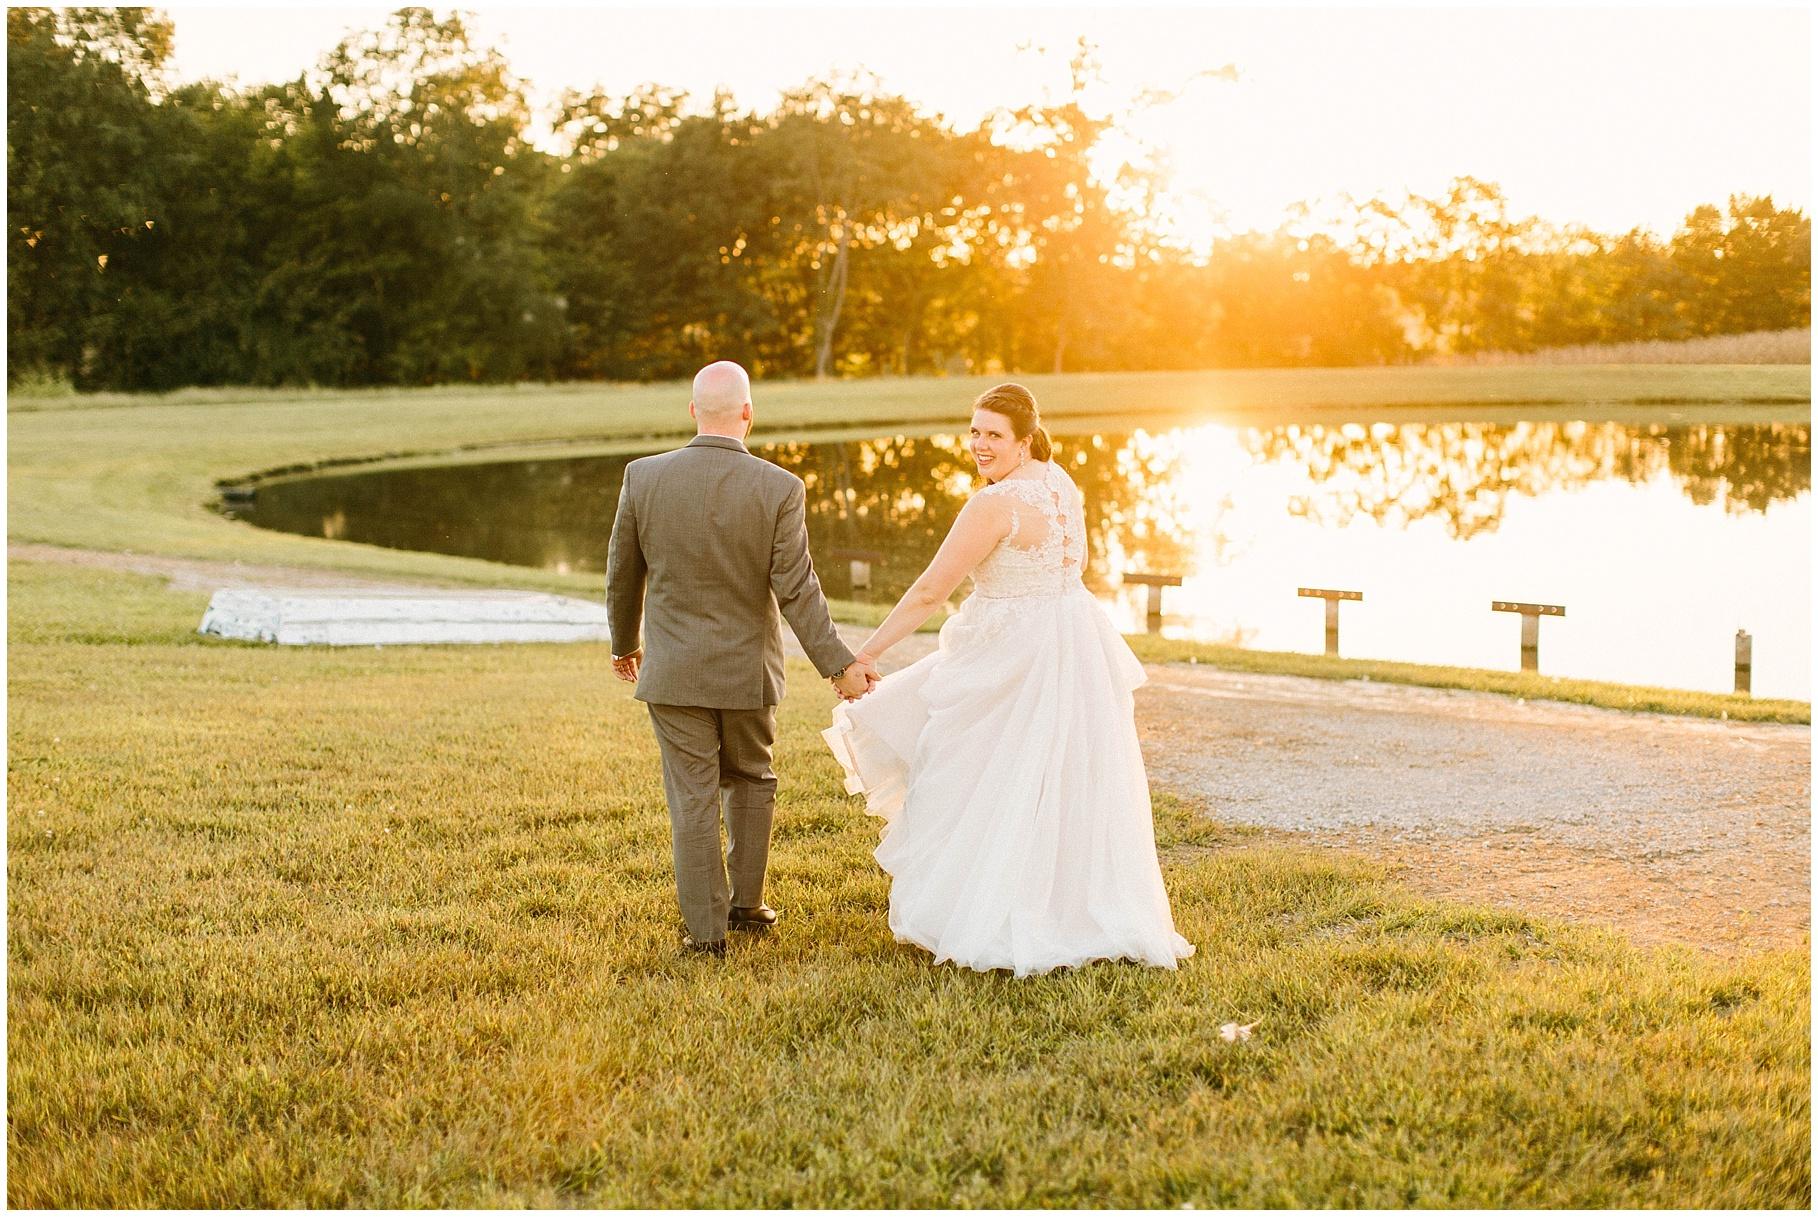 Veronica Young Photography, Vineyard wedding, St. Louis wedding photographer